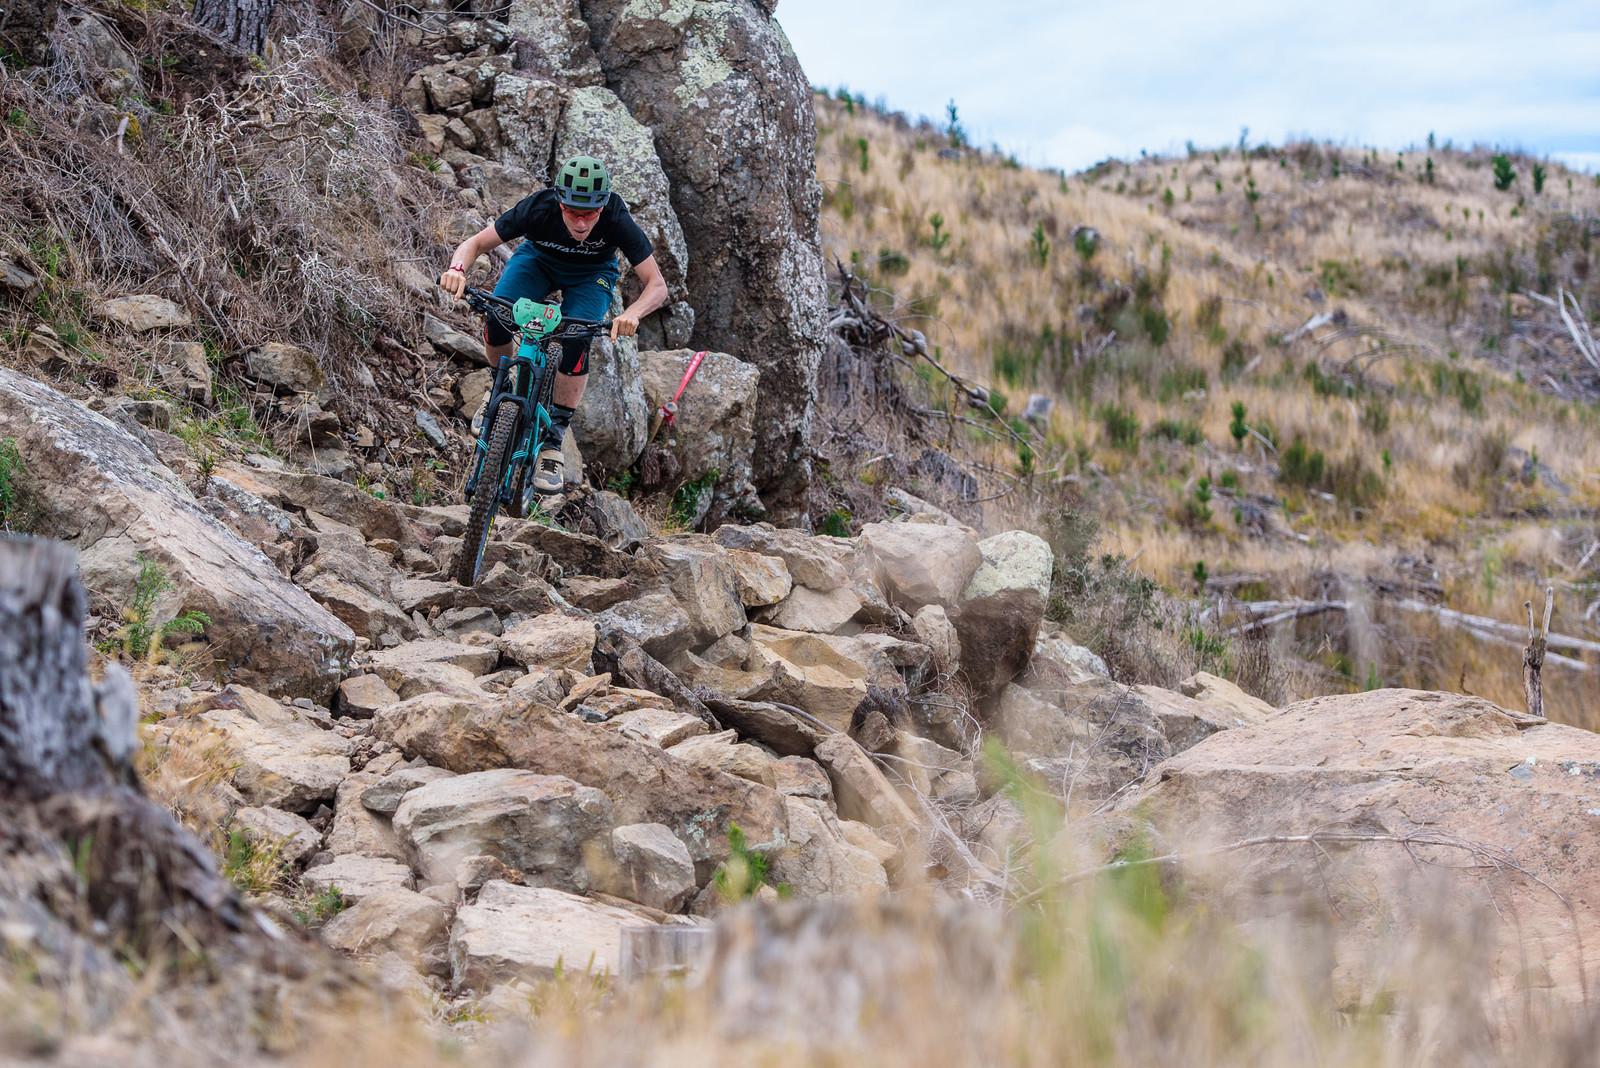 NZenduro19 day 3 DShaw-8769 - 2019 NZ Enduro Day 3 Photo Gallery - Mountain Biking Pictures - Vital MTB